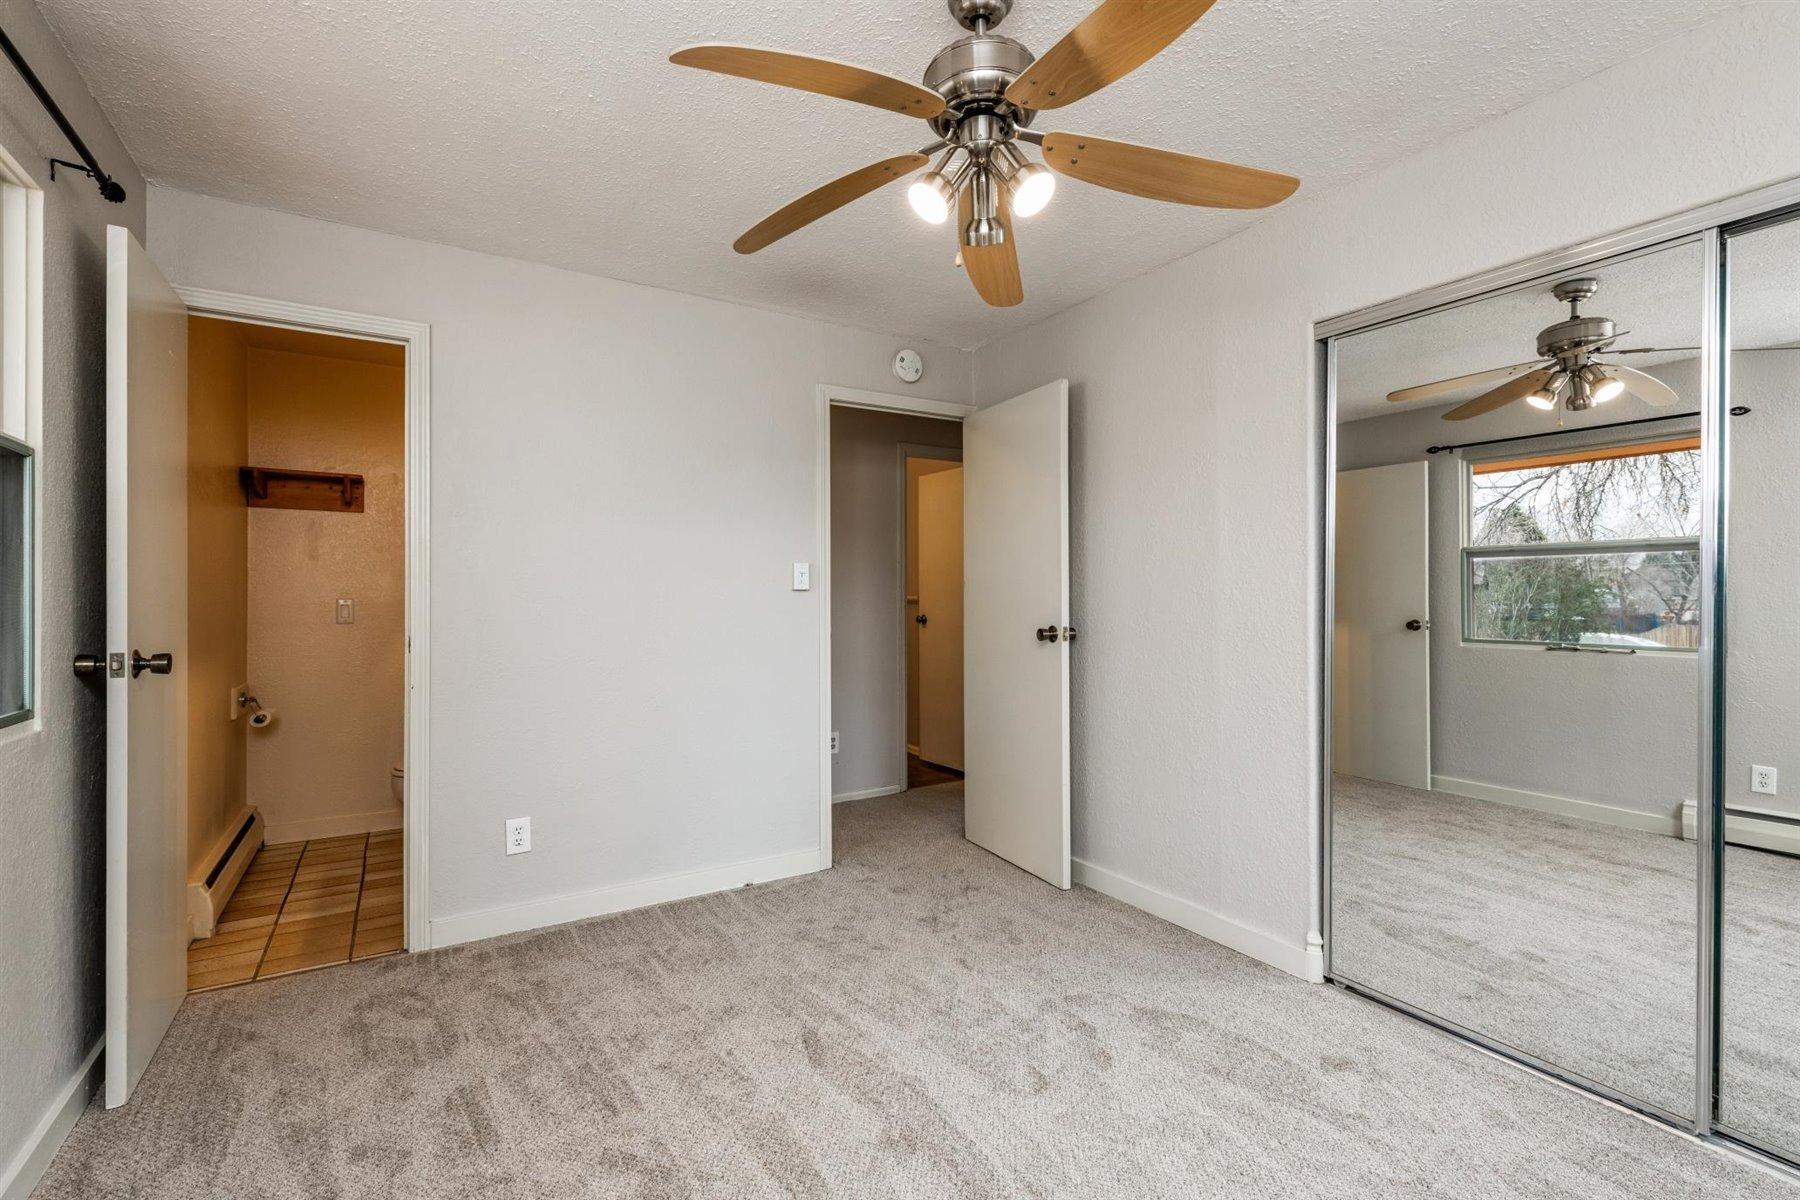 Bedroom with adjacent 1/2 bath